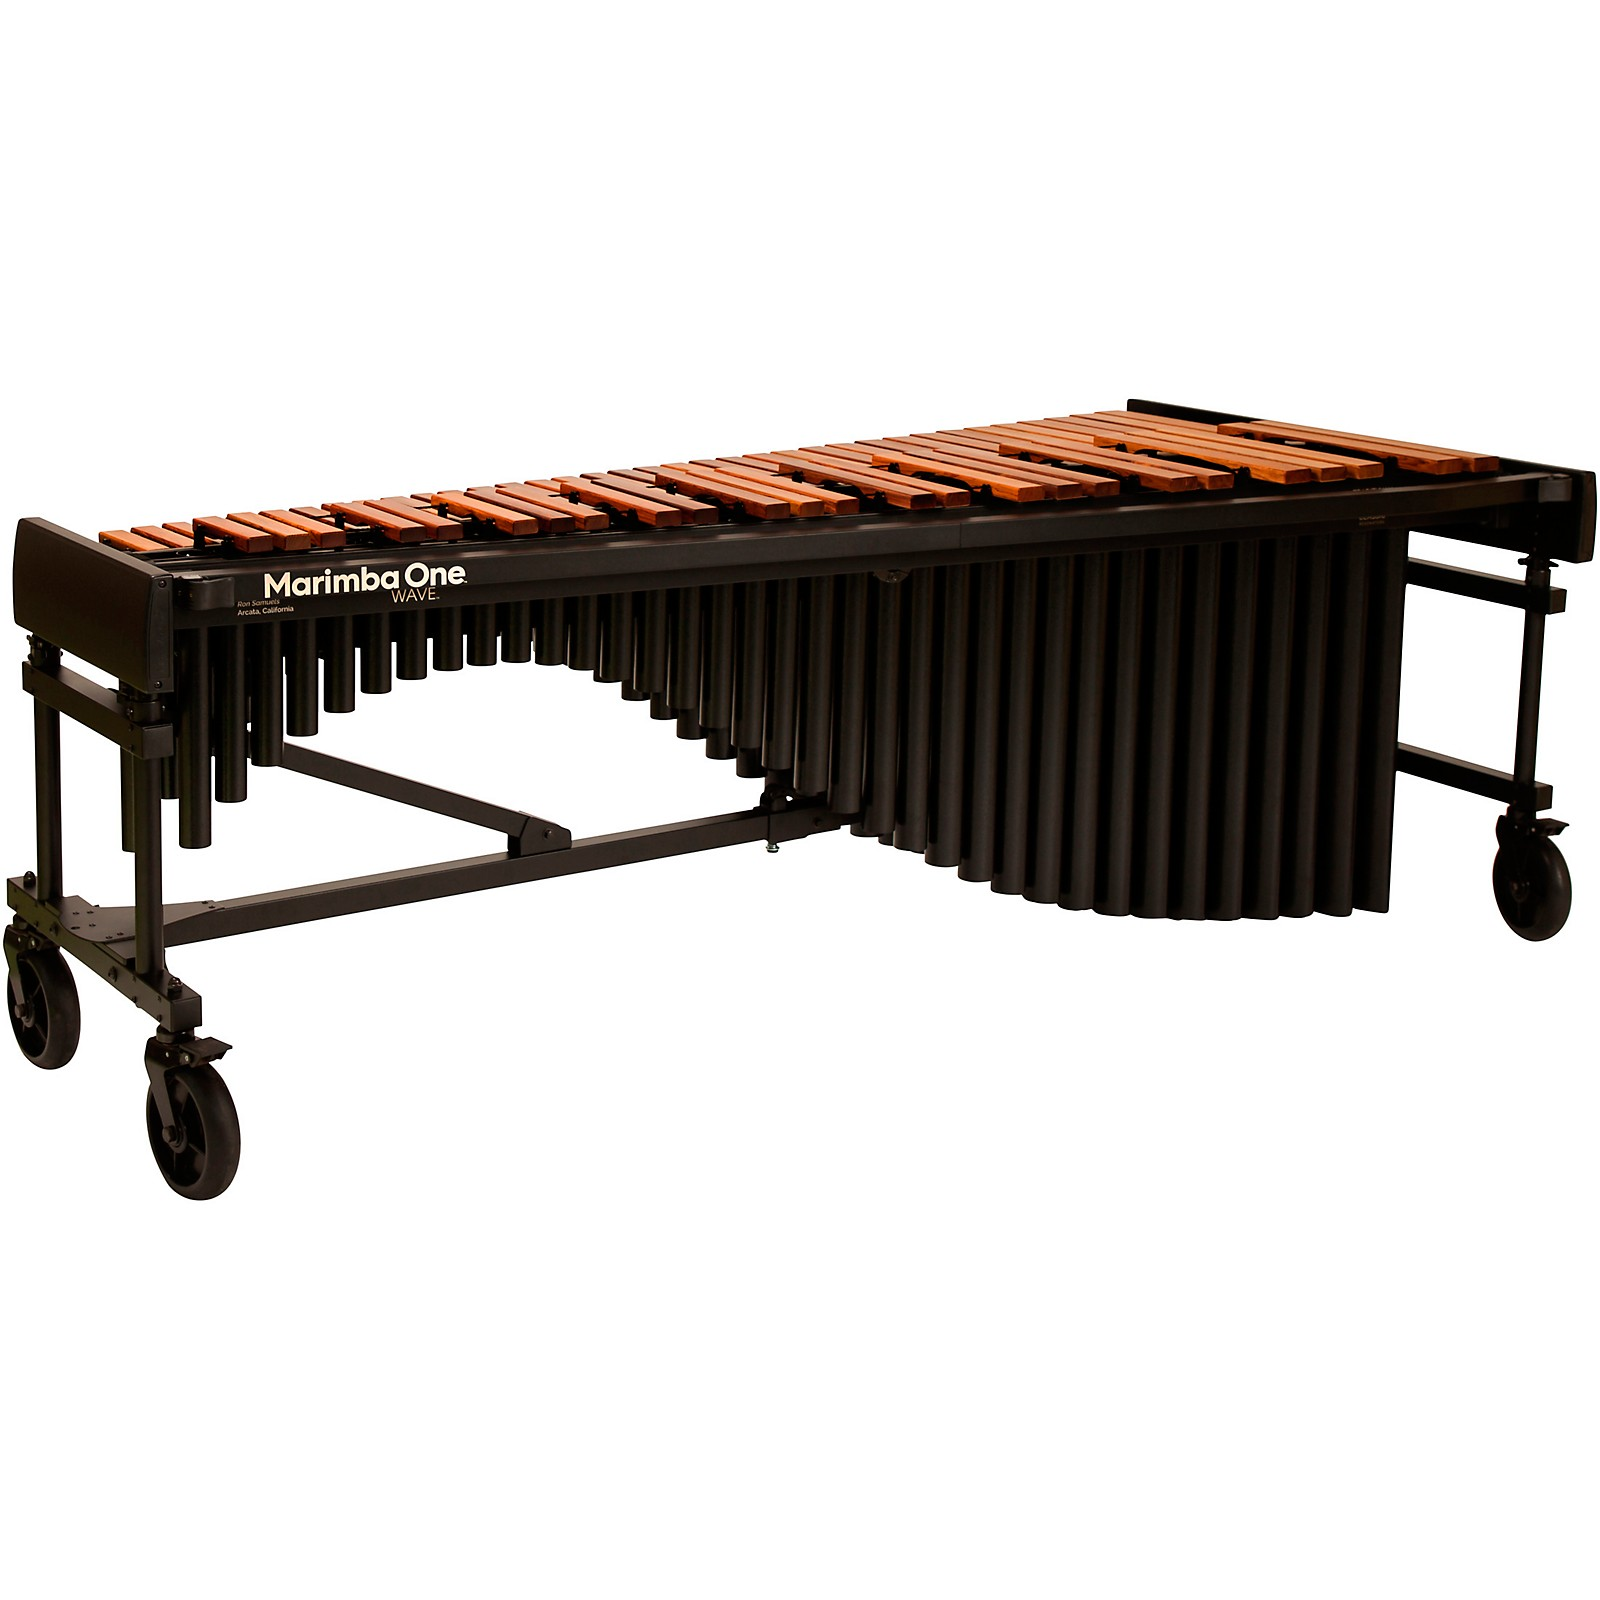 Marimba One Wave #9616 A442 5.0 Octave Marimba with Premium Keyboard and Basso Bravo Resonators 8